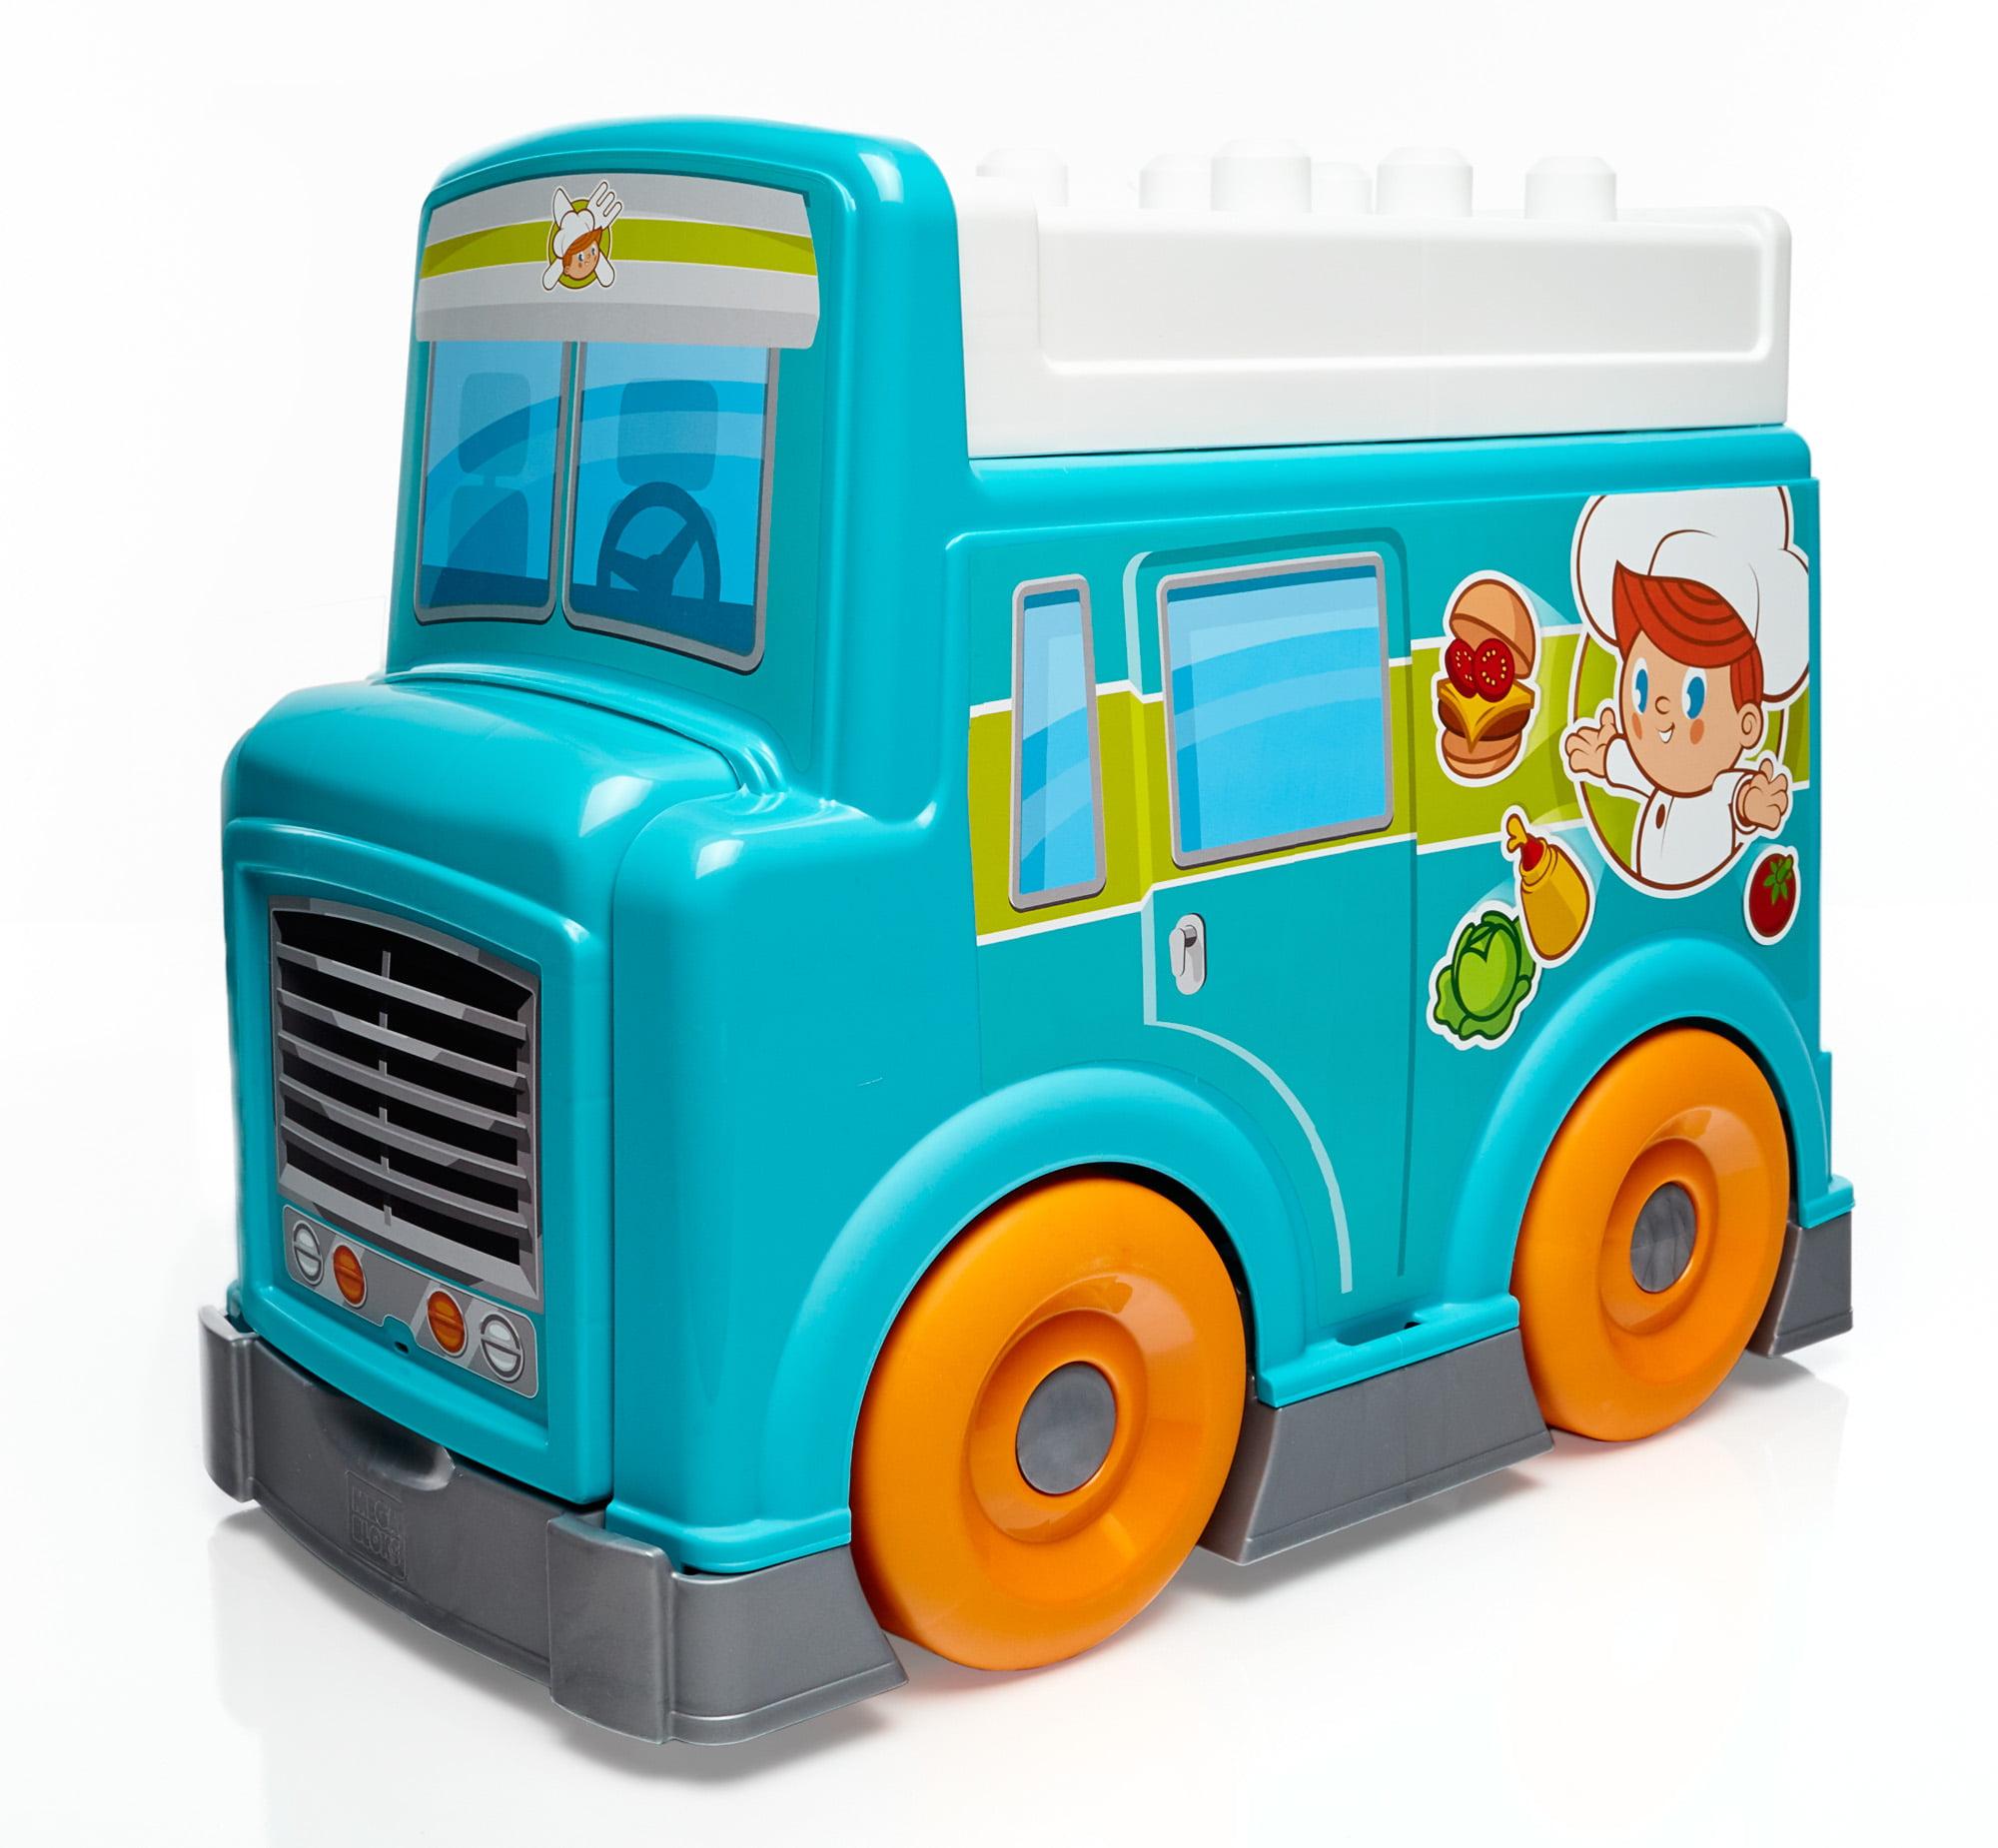 Mega Bloks Food Truck Kitchen by Mattel